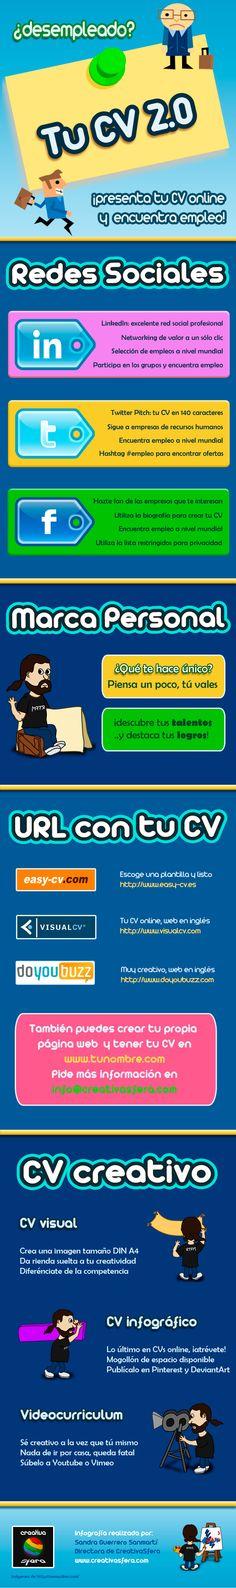 Infografía: ¿Desempleado? Tu CV 2.0 para Encontrar Empleo http://www.onedigital.mx/ww3/2012/05/08/infografia-desempleado-tu-cv-2-0-para-encontrar-empleo/